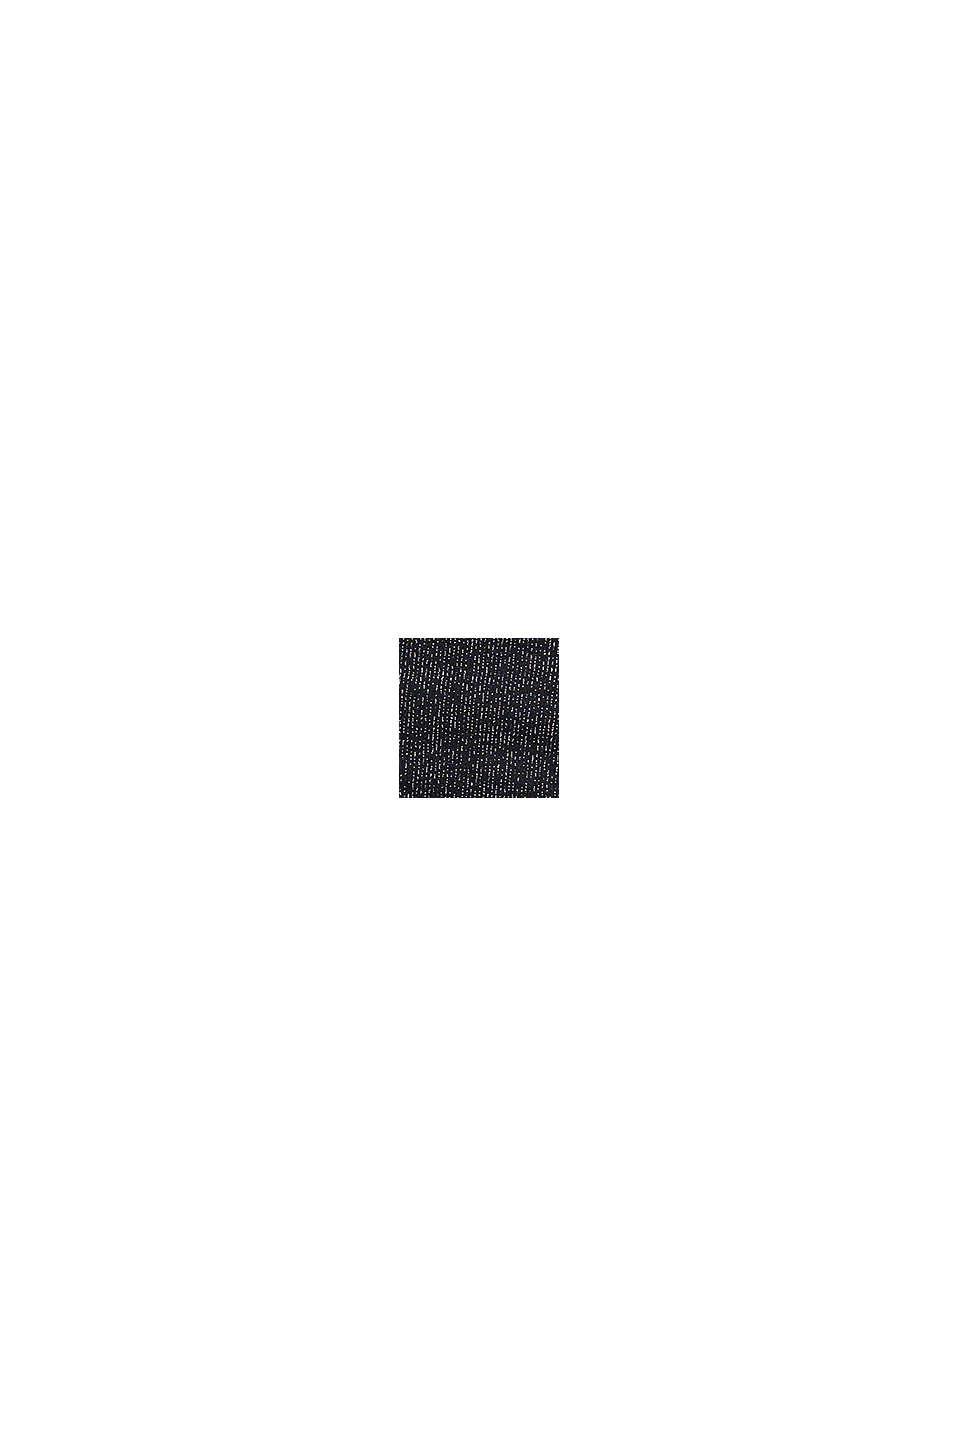 Kimalleraidalliset alushousut, BLACK, swatch